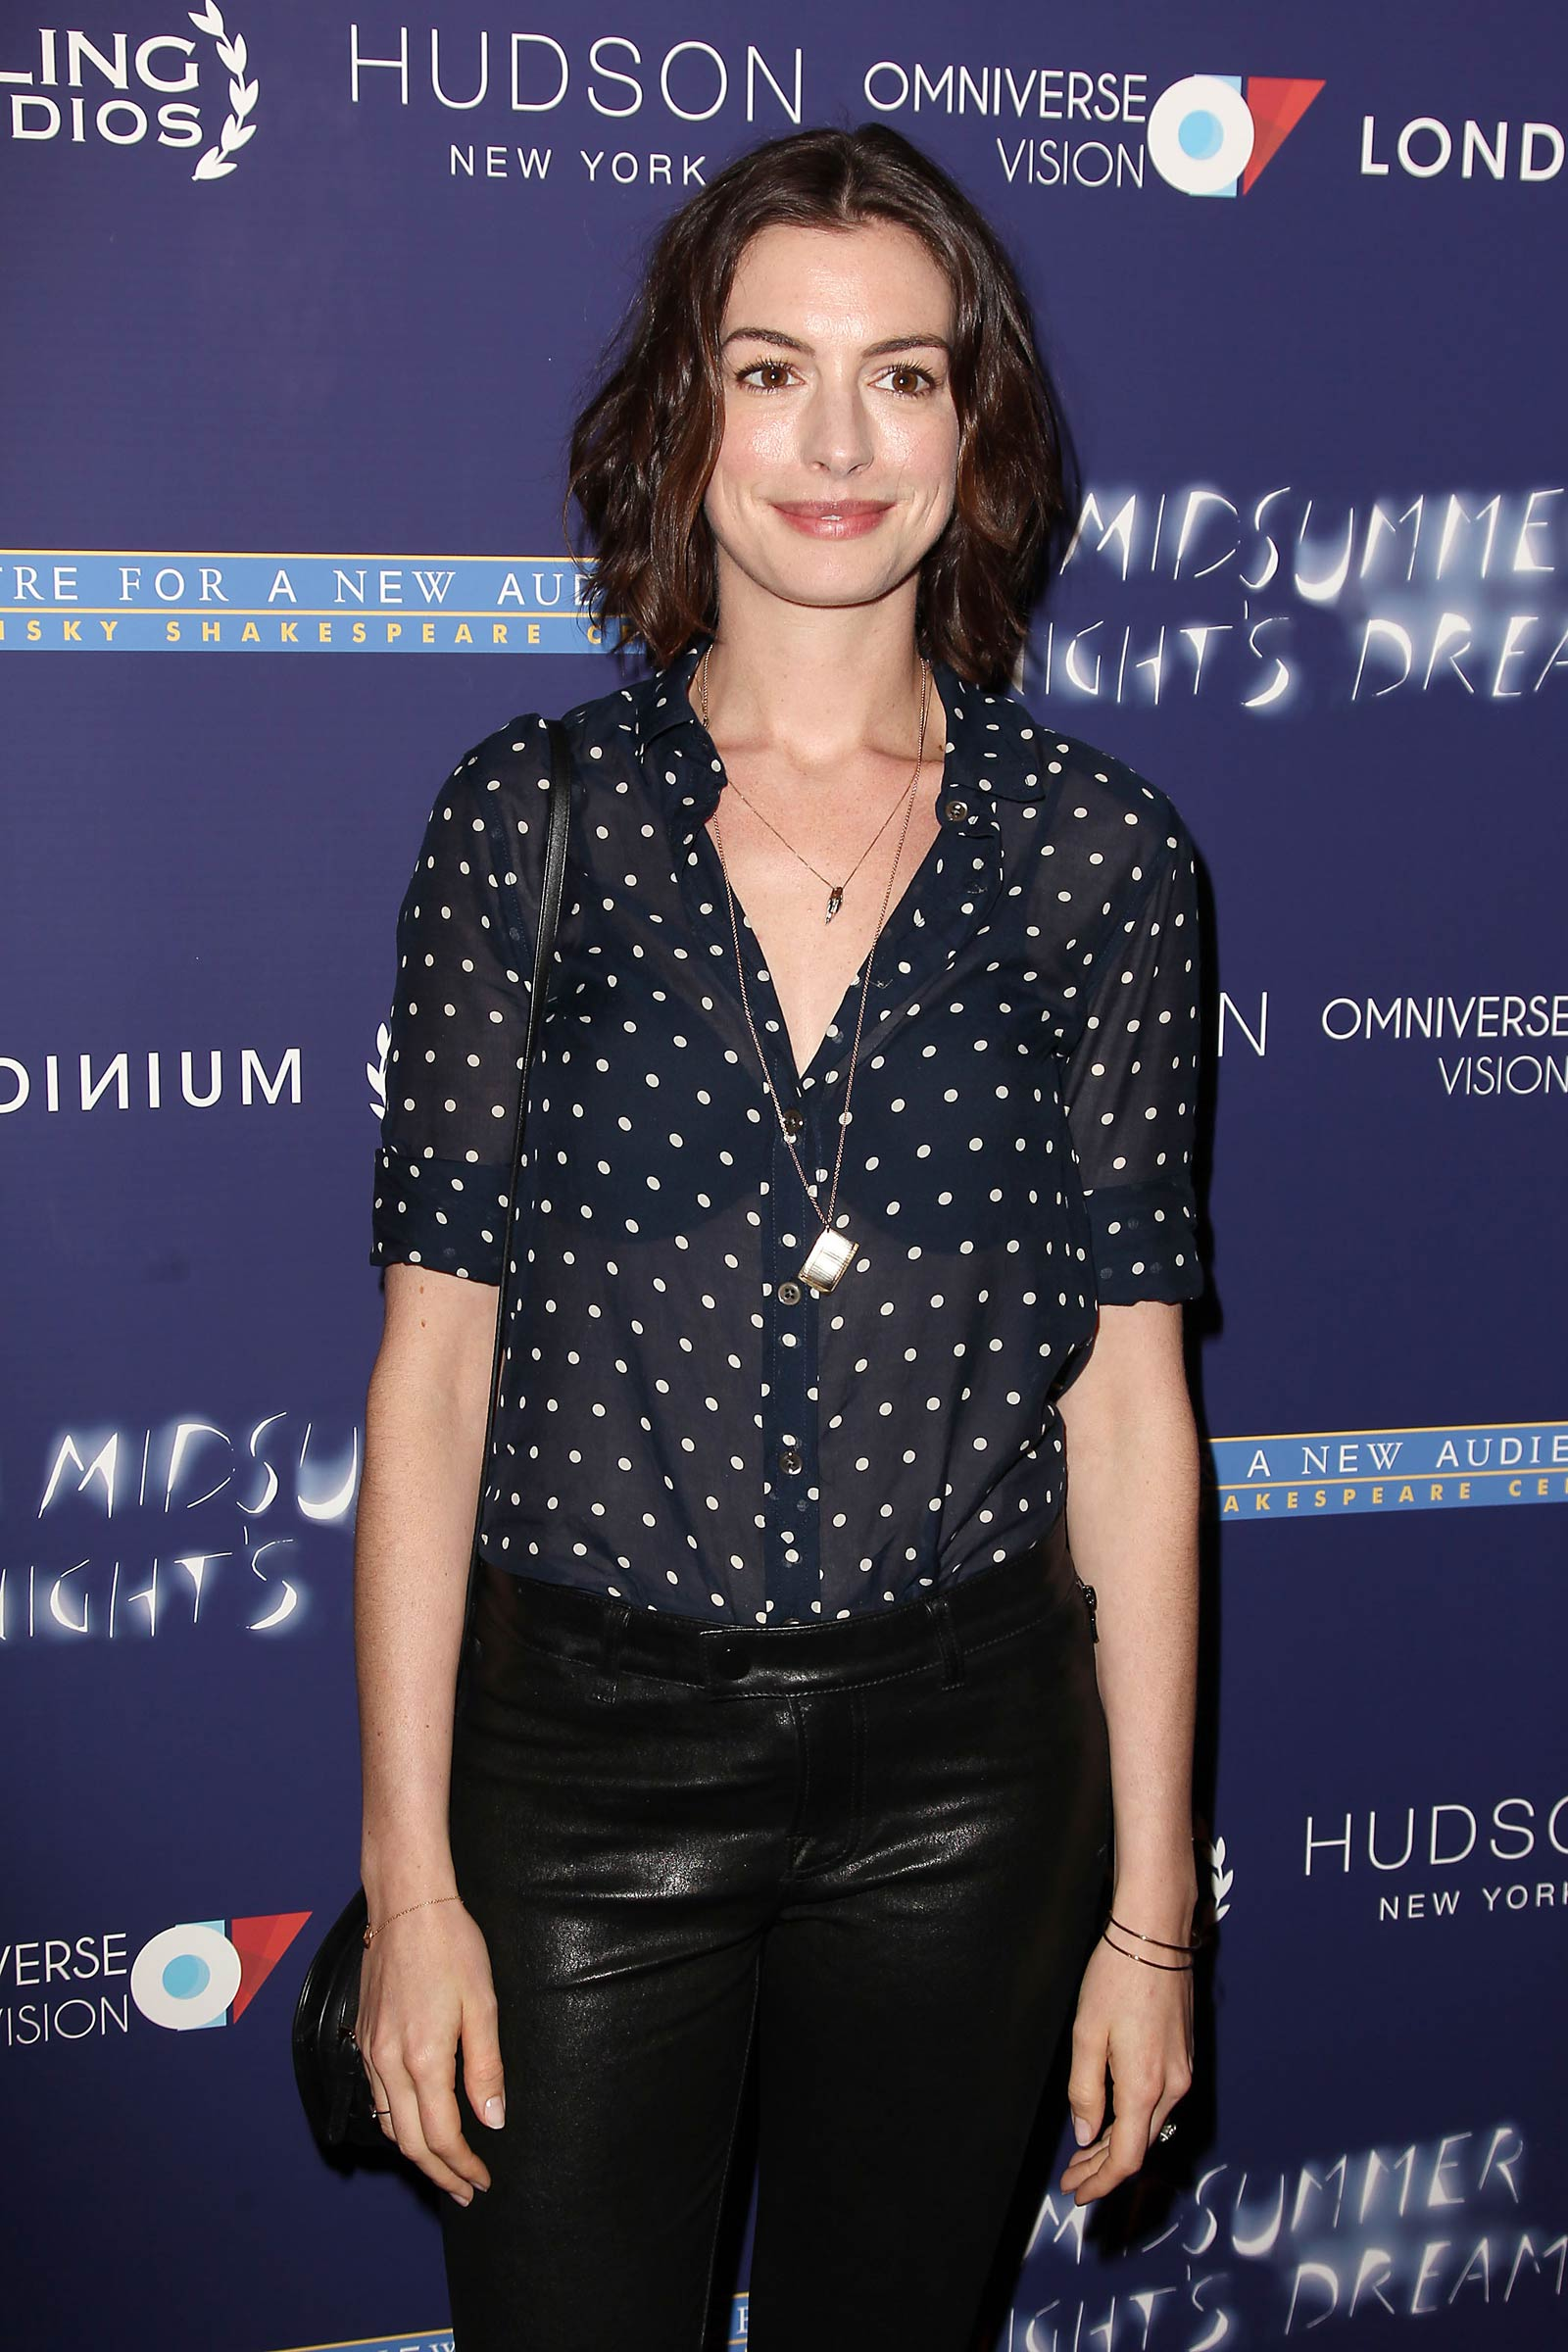 Anne Hathaway attends A Midsummer Night's Dream premiere